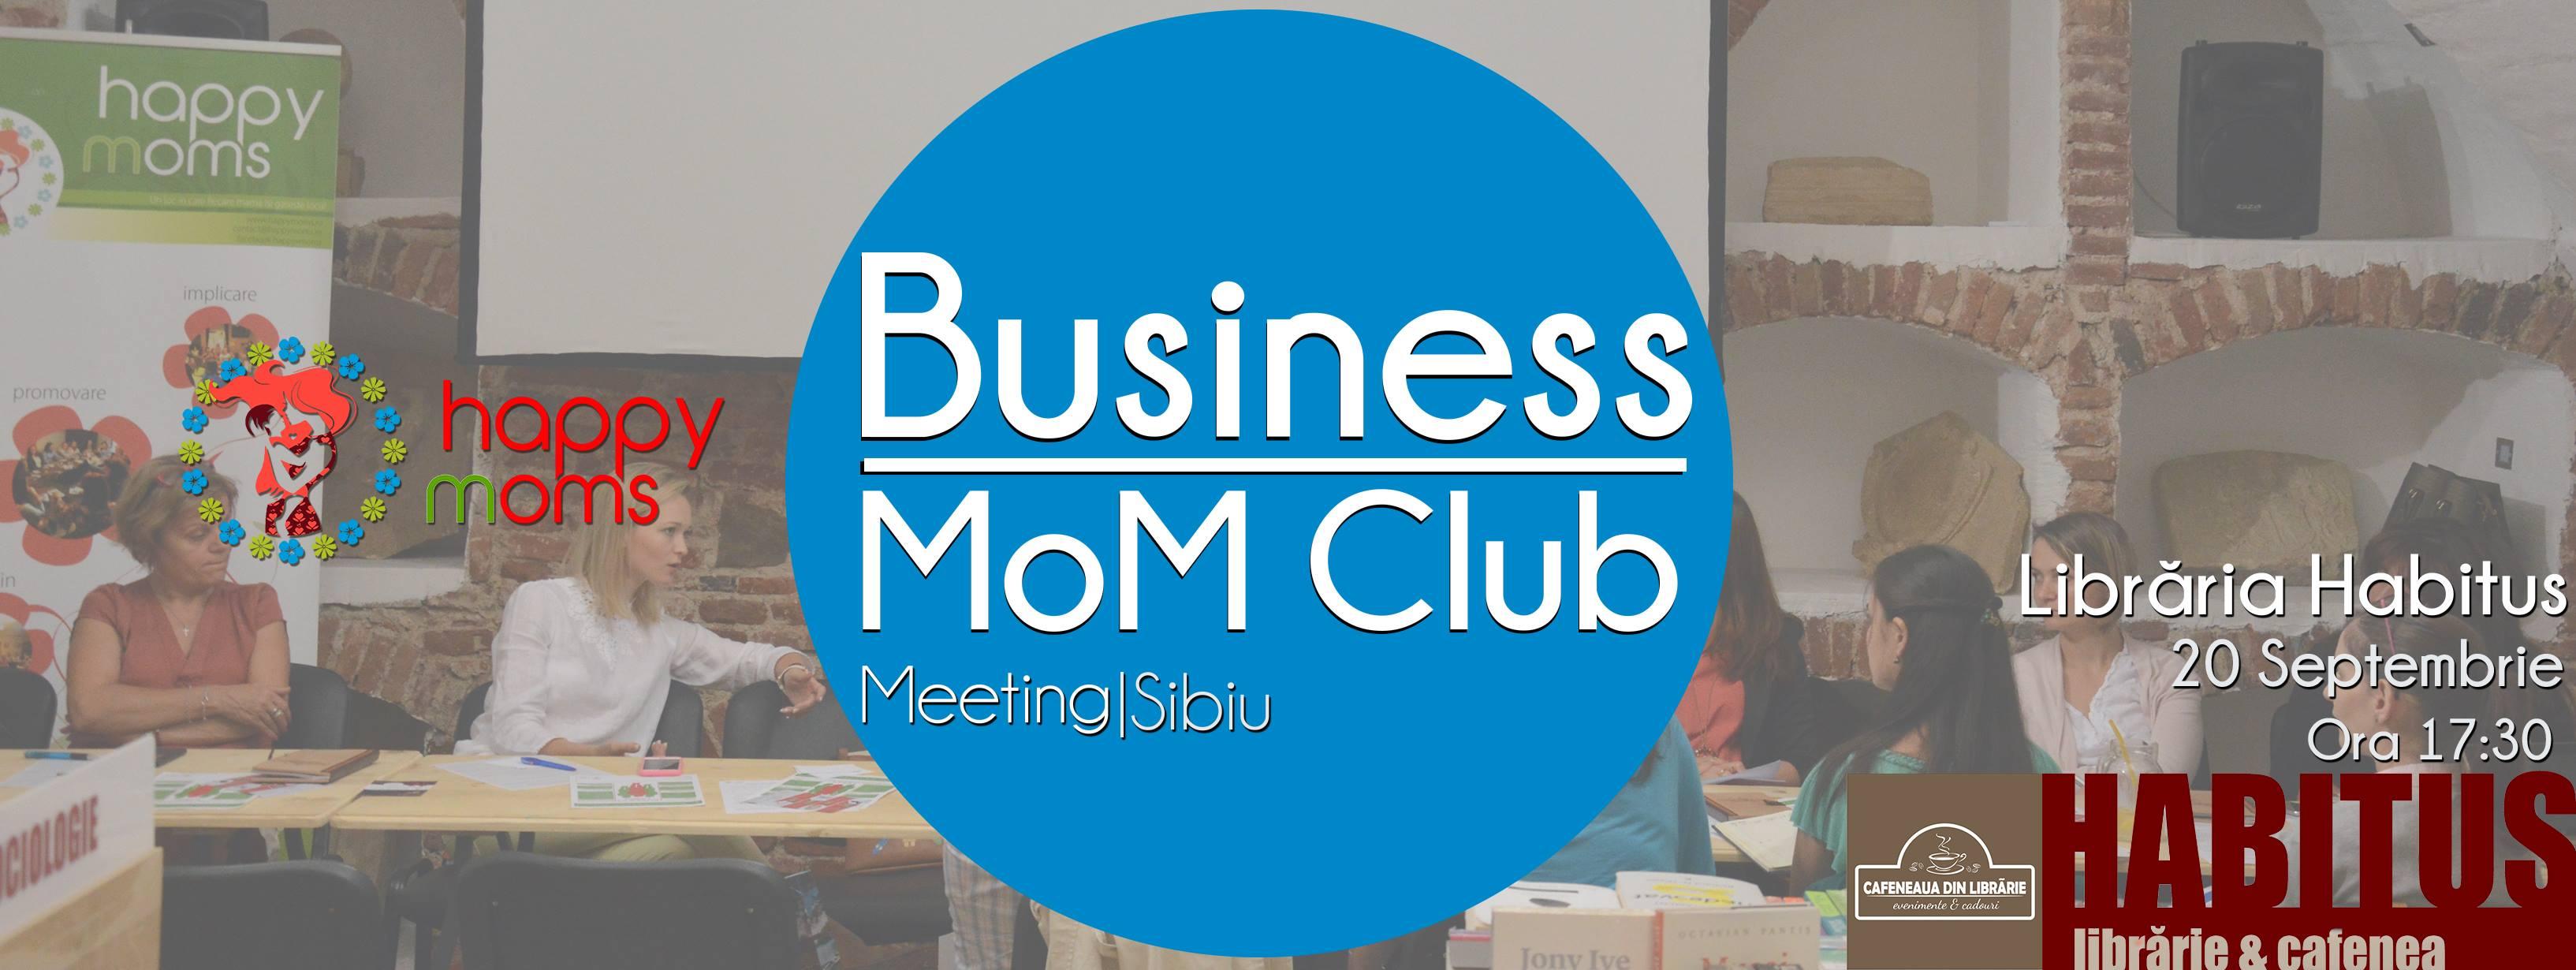 Întâlnire Business MoM Club Sibiu